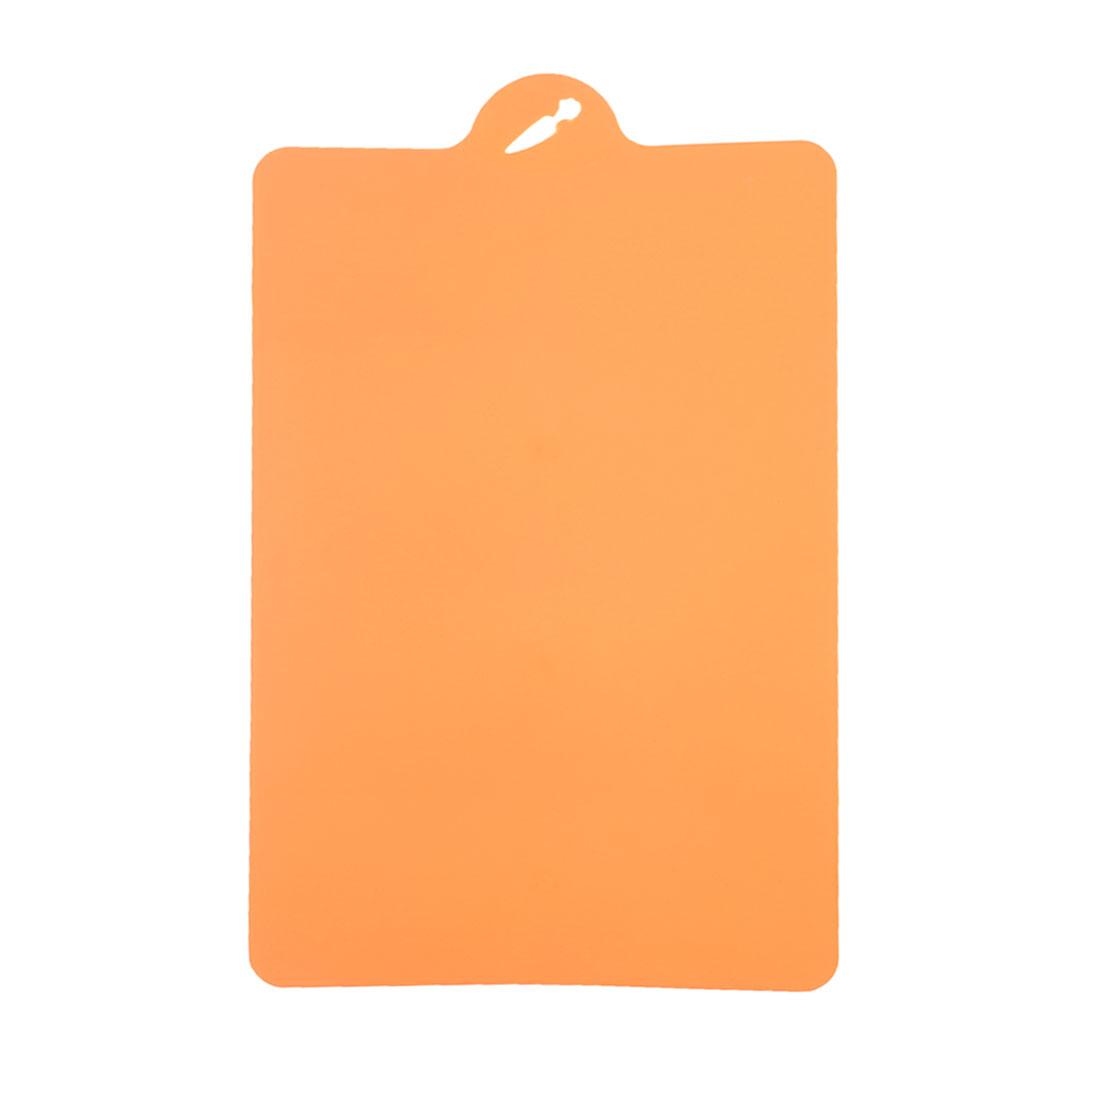 Orange Plastic Rectangle Shape Nonslip Chopping Board